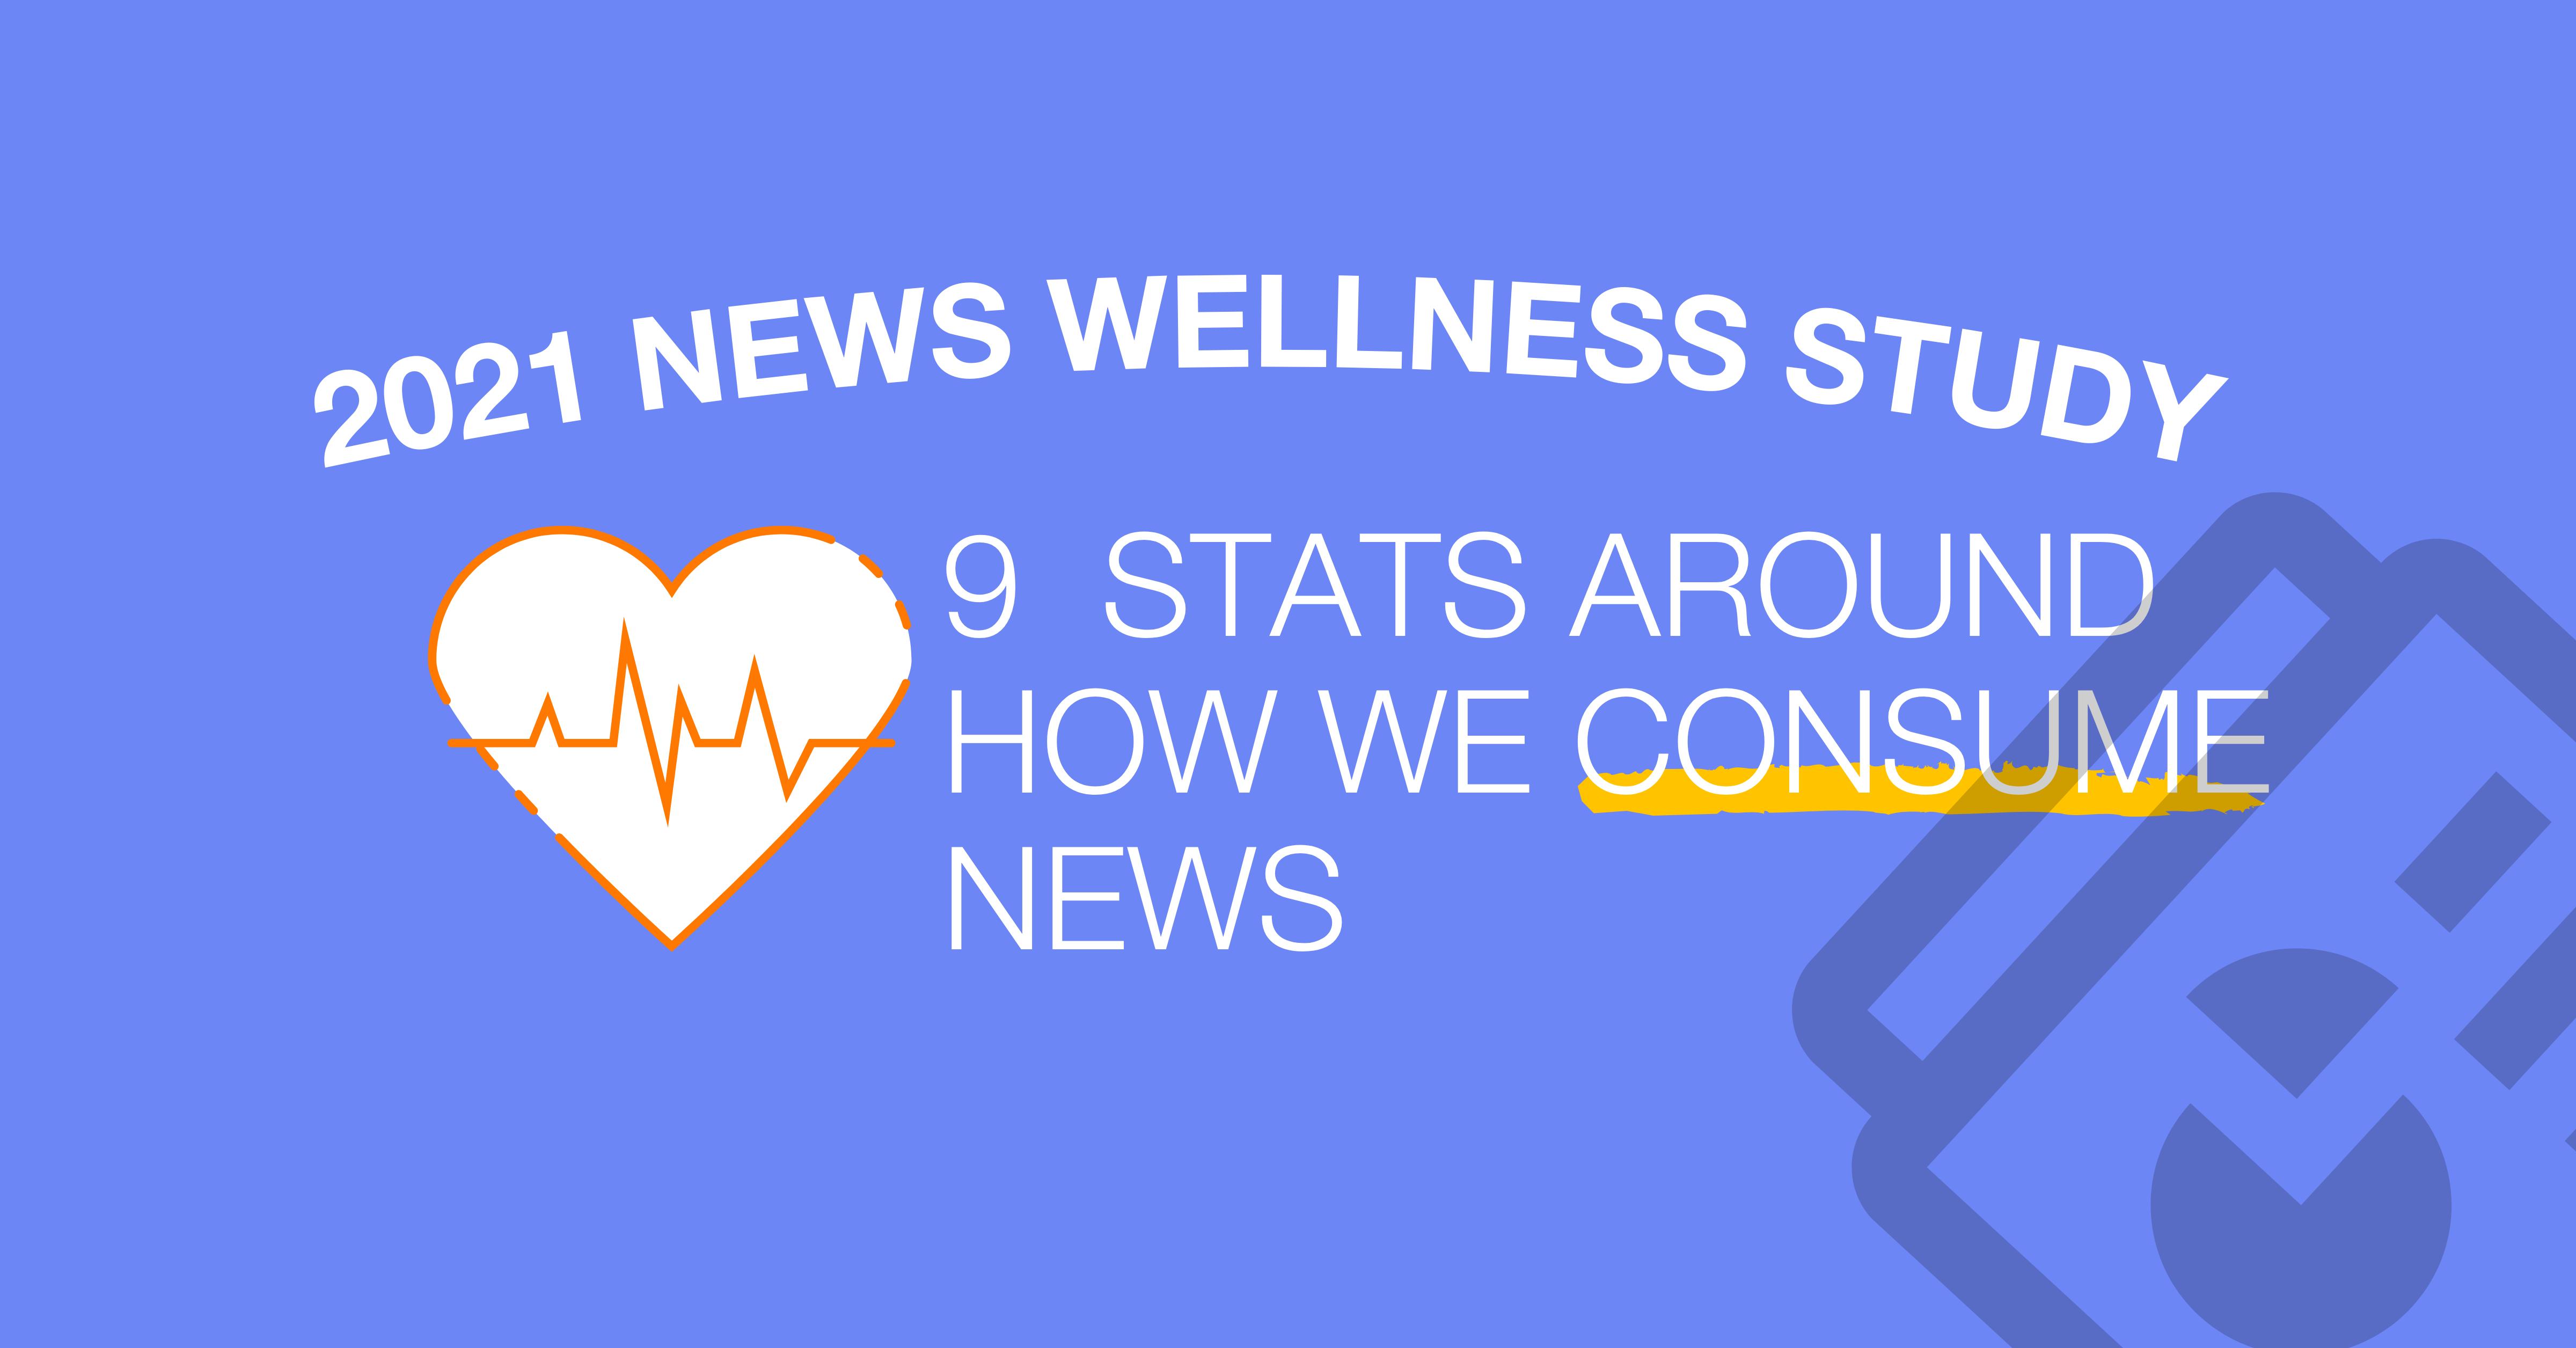 2021 News Wellness Study